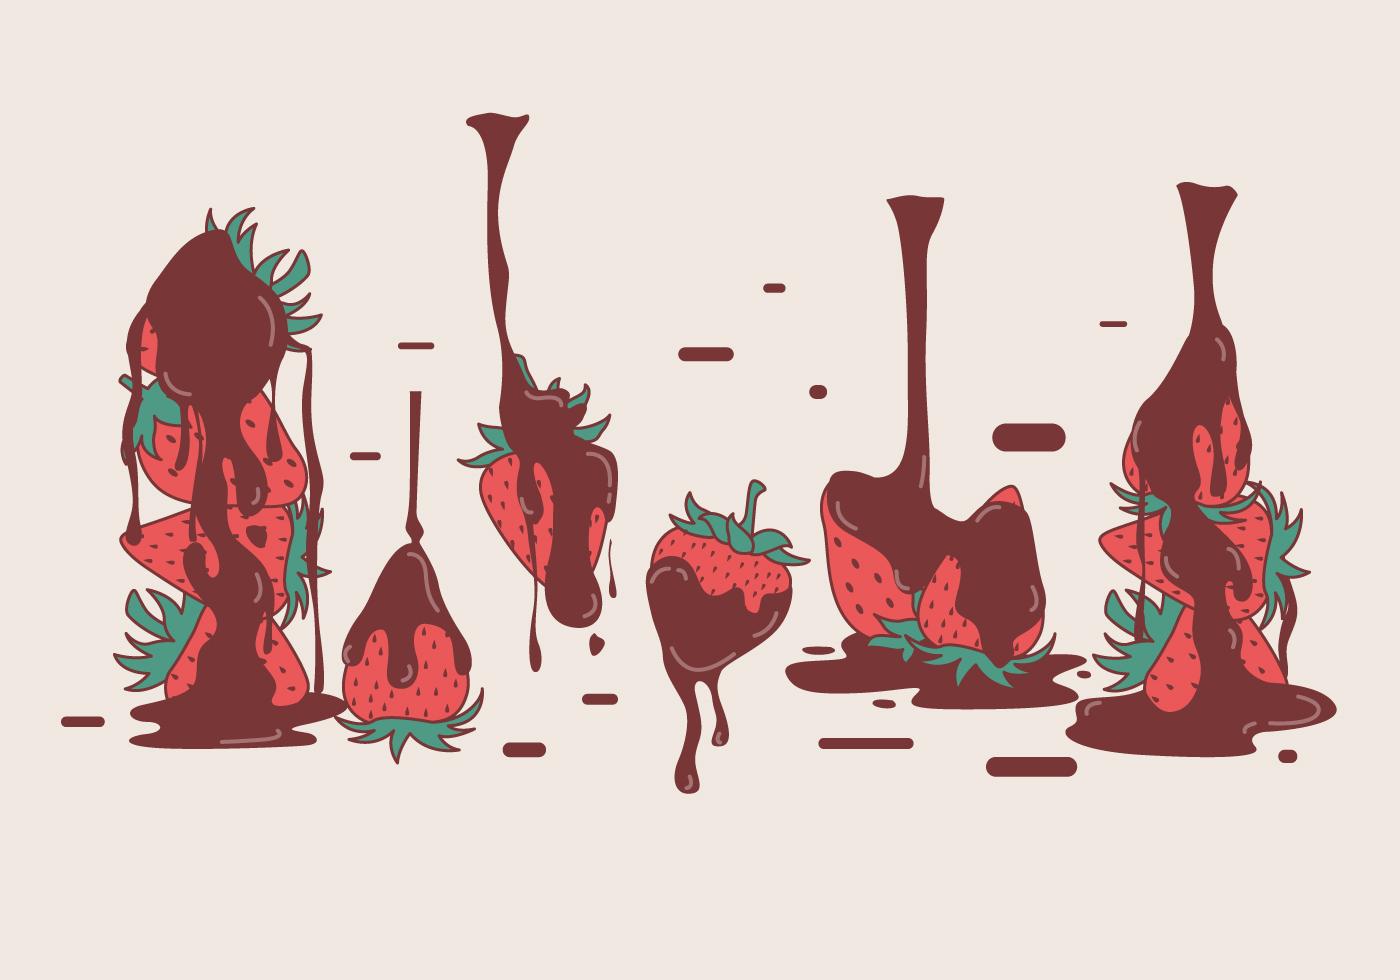 Chocolate Strawberry Free Vector Art 1464 Free Downloads